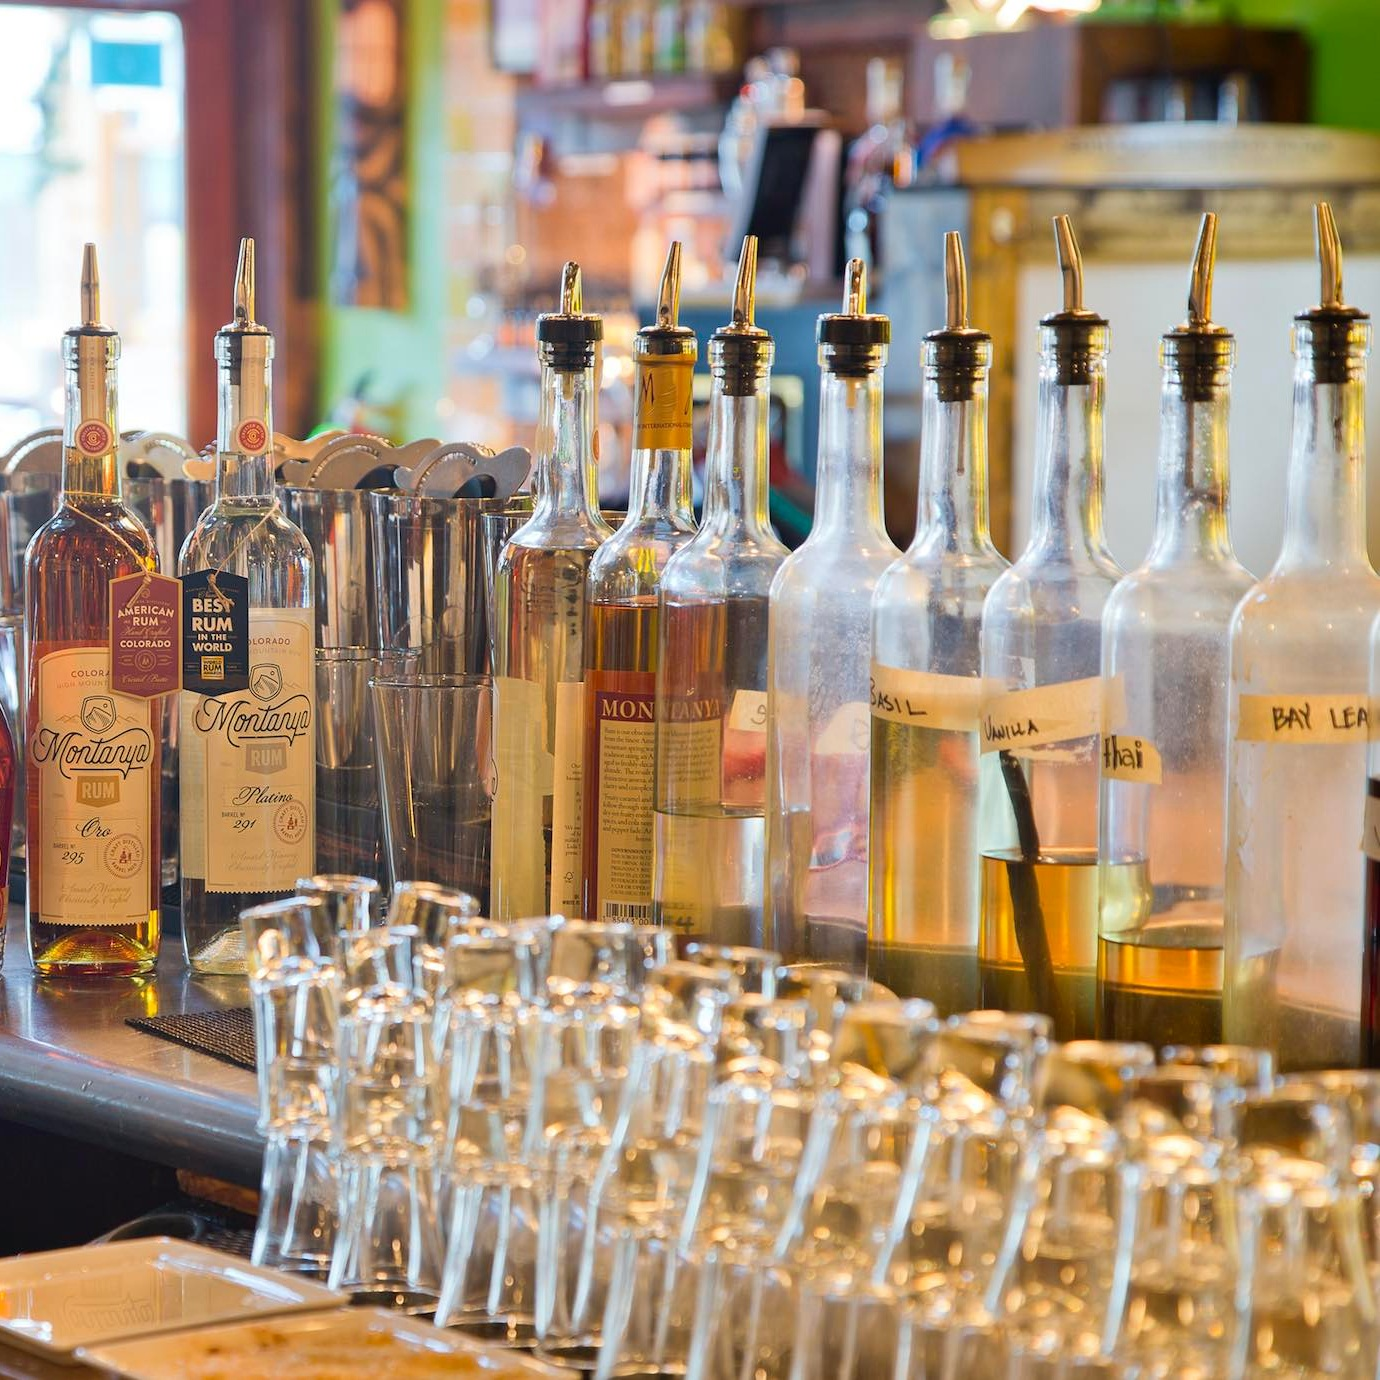 Homemade syrups line the bar at Montanya Distillers